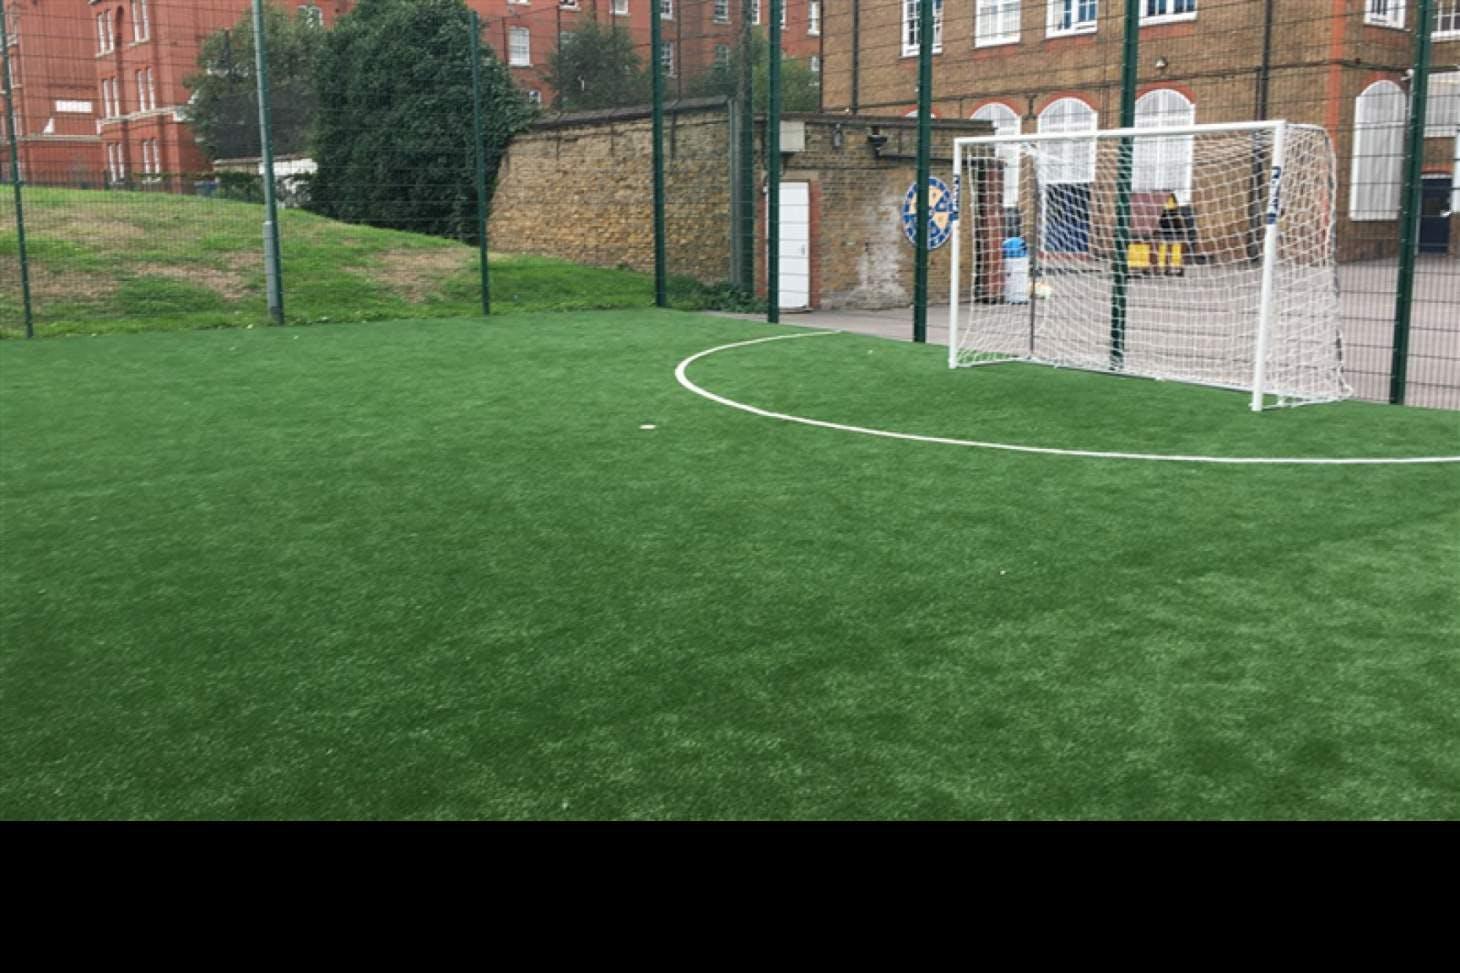 London Bridge Snowsfields 5 a side | 3G Astroturf football pitch